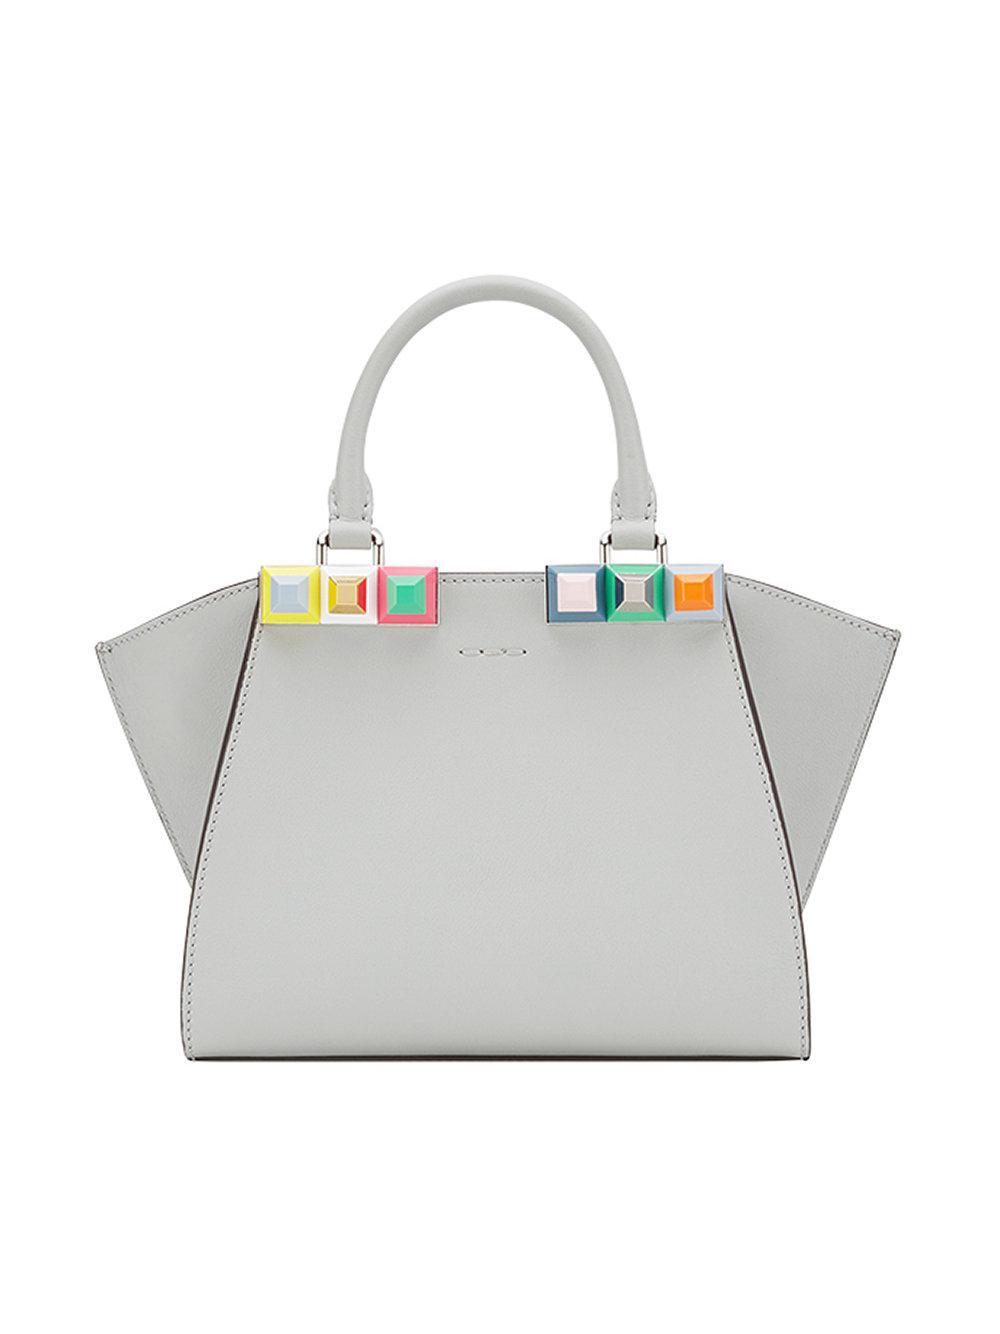 Lyst - Fendi Studded 3jours Mini Bag in Gray 121050fbe3dda